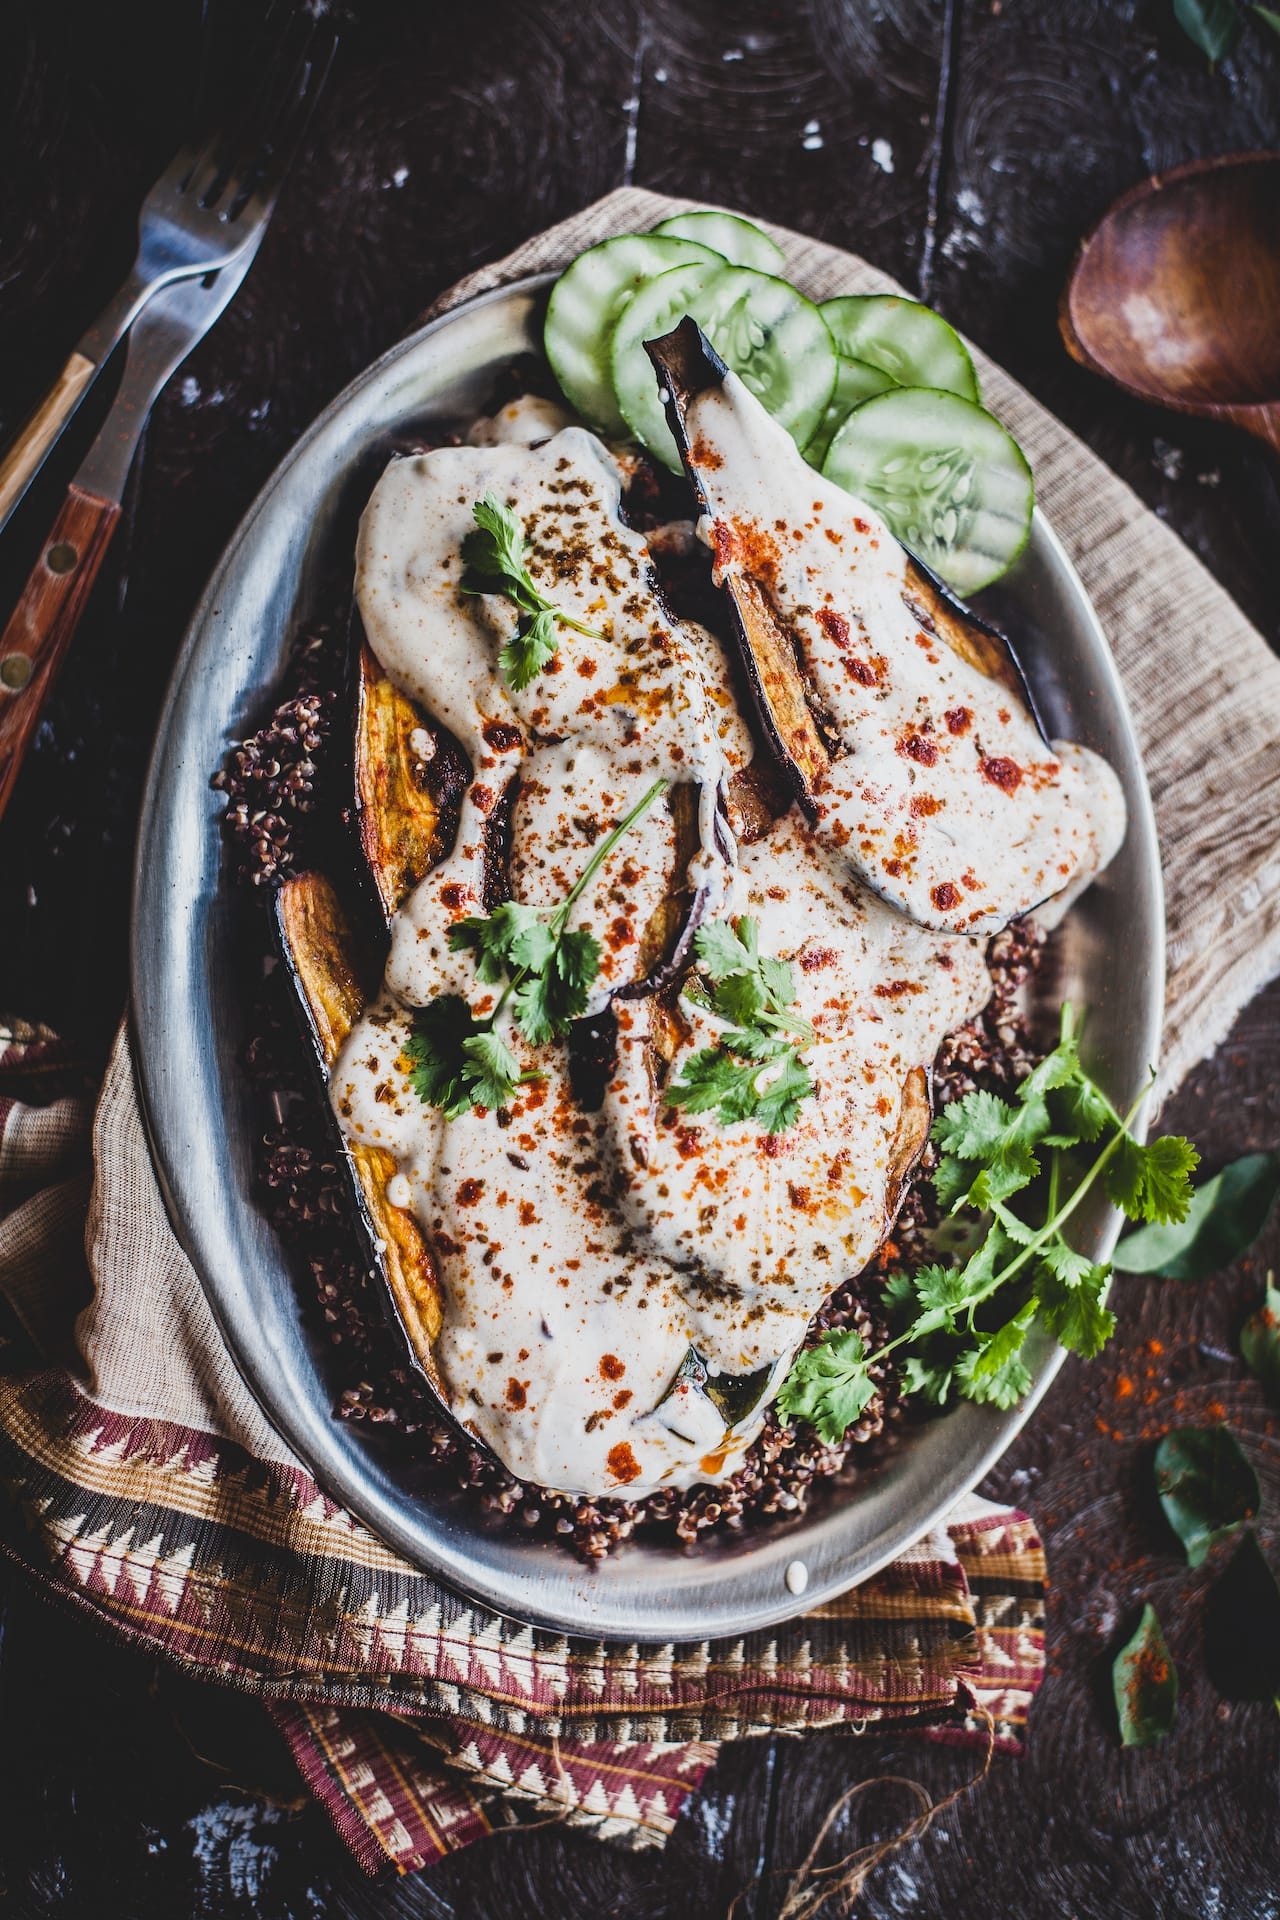 Doi Begun (Eggplant In Spiced Yogurt) | Playful Cooking